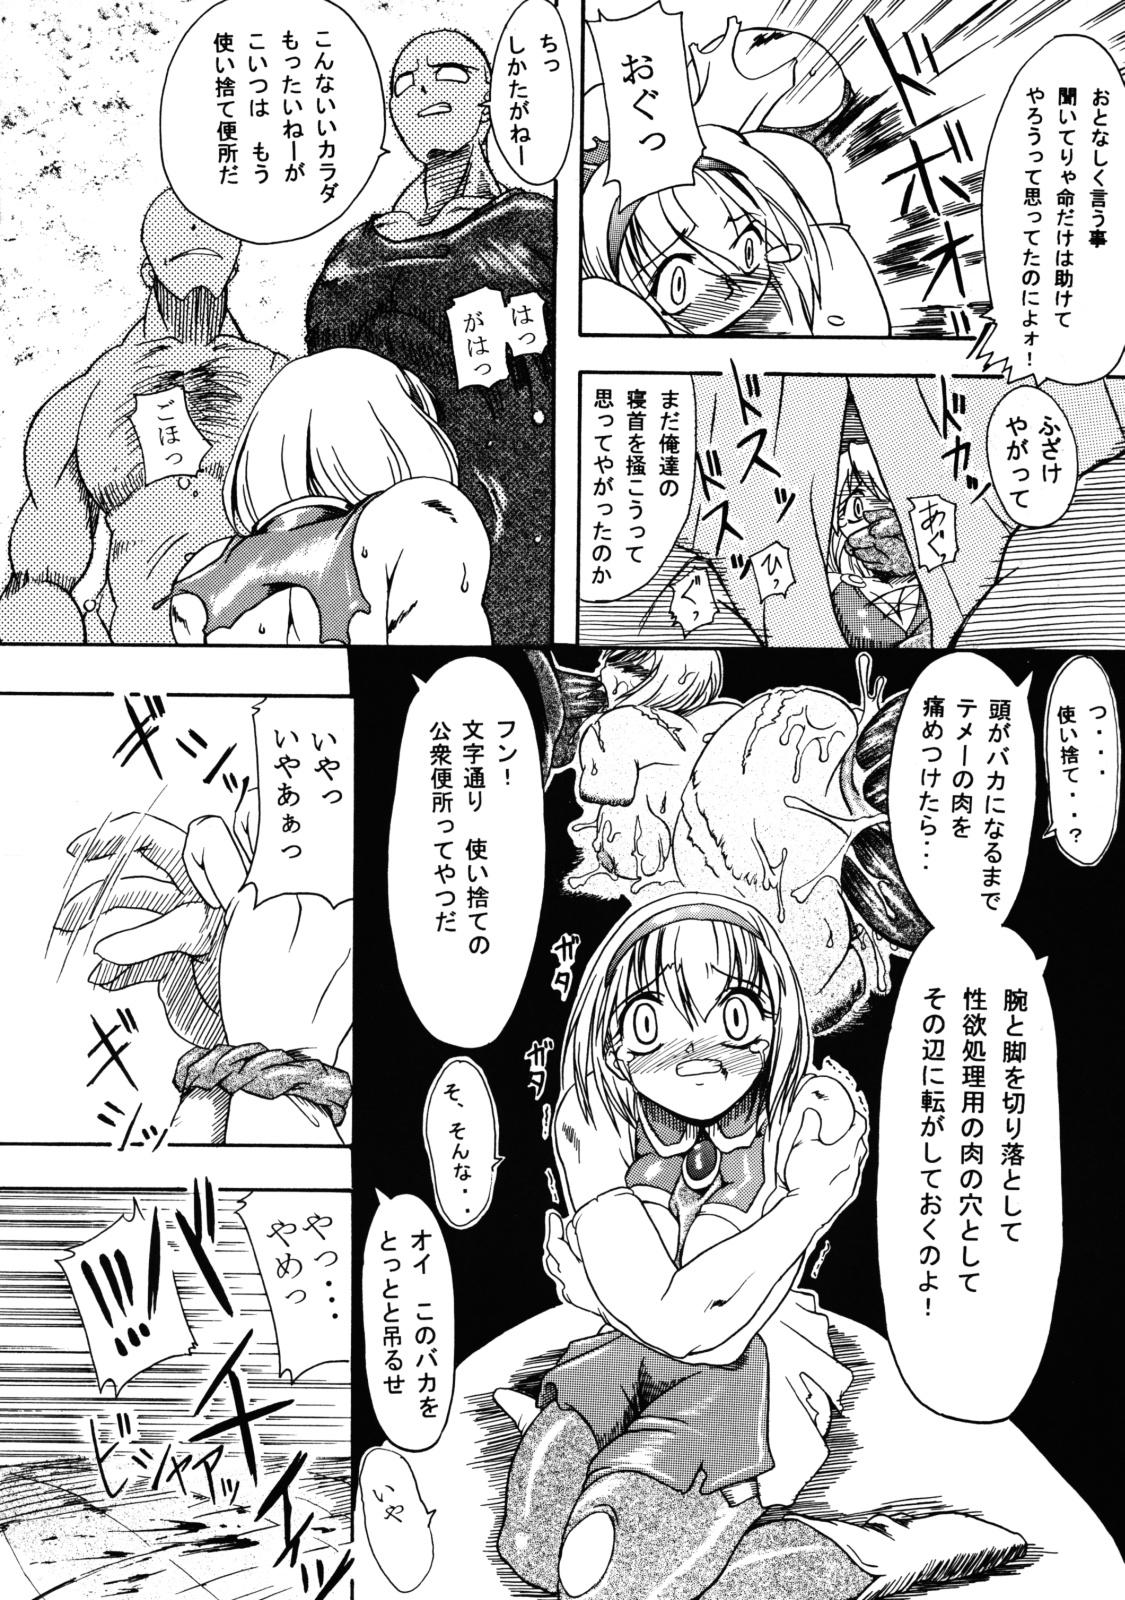 Kakugee Sanmai 3 10